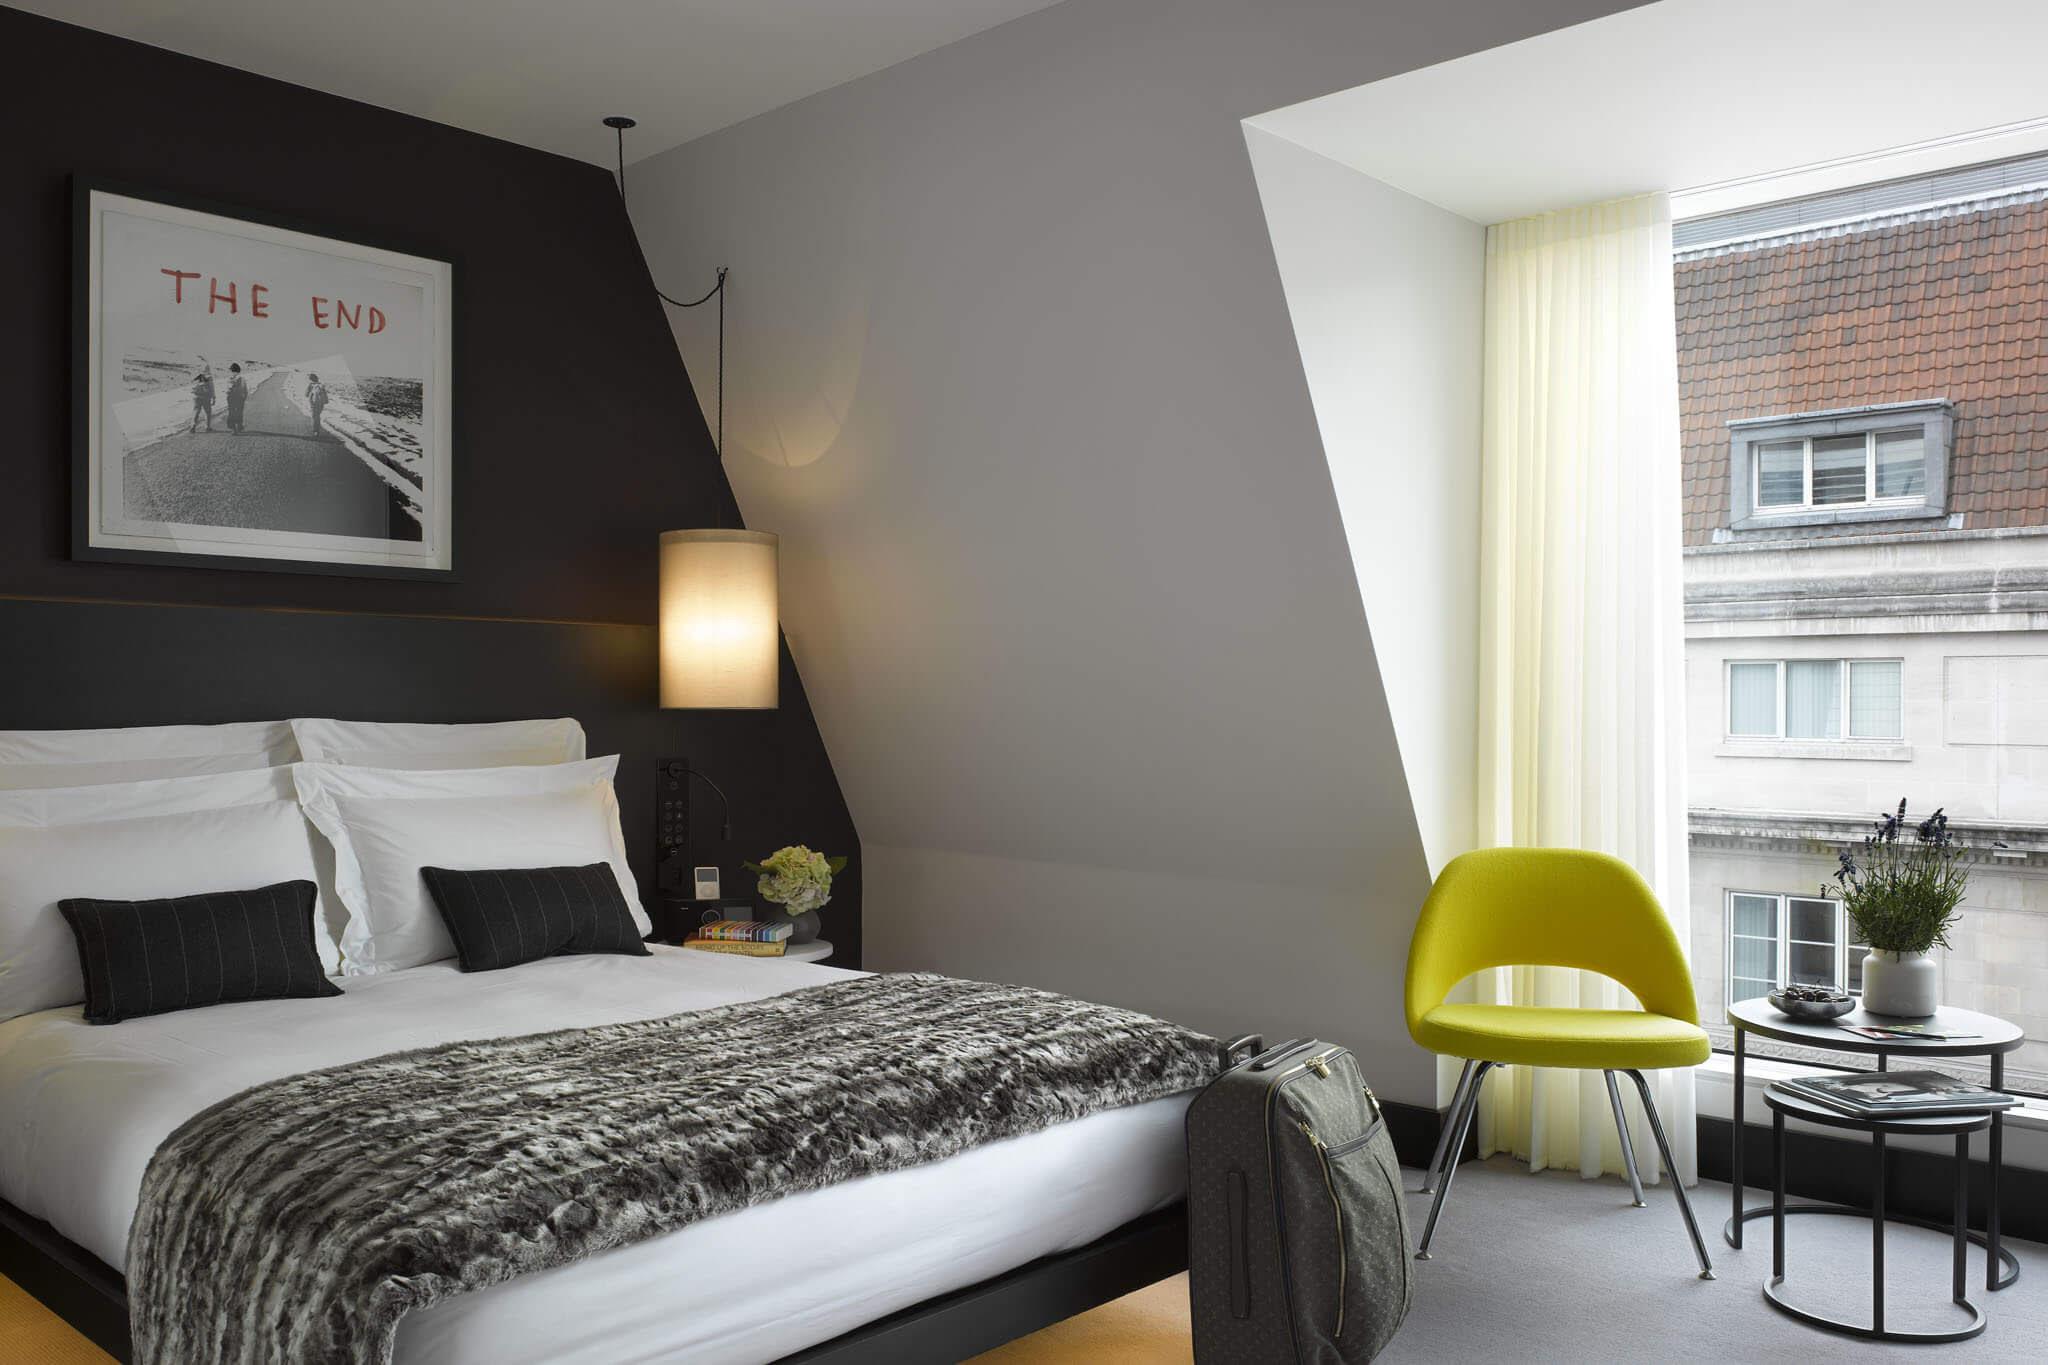 Most Amusing Hotel Bedroom Designs Found All Around The World